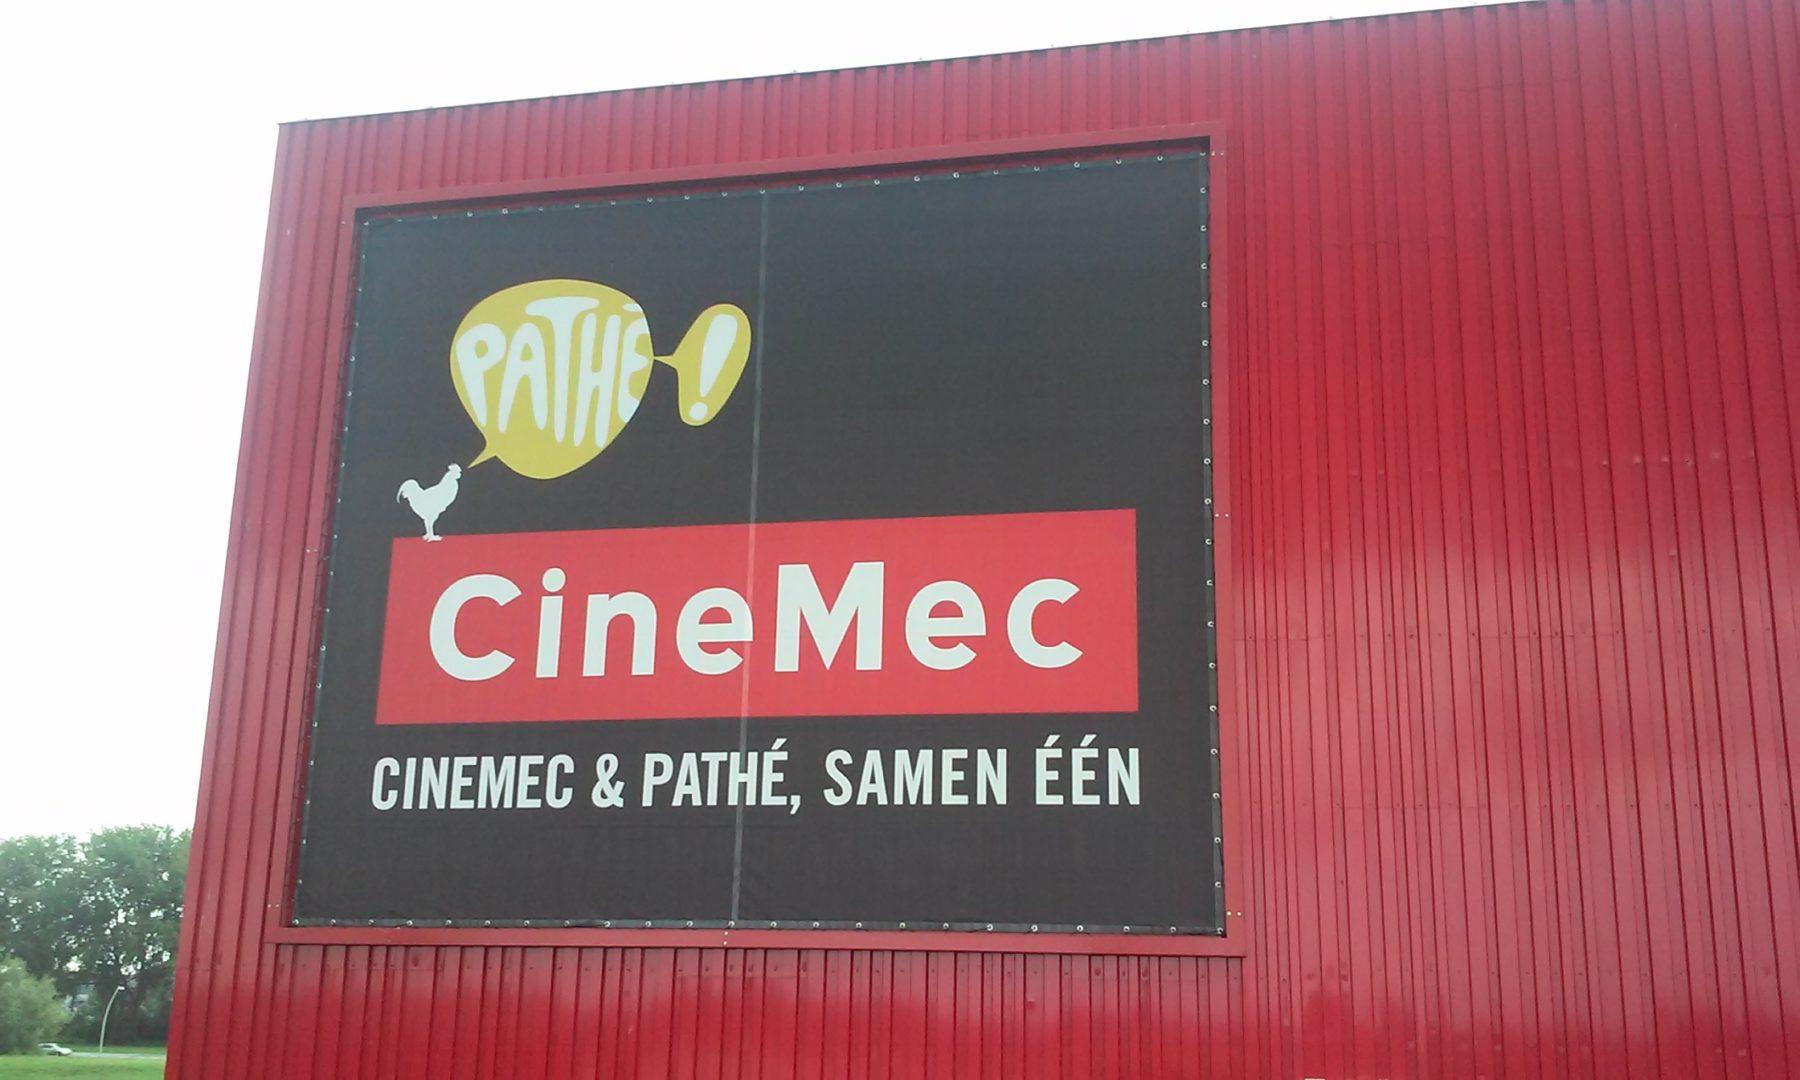 Cinemec & Pathé | Geveldoeken